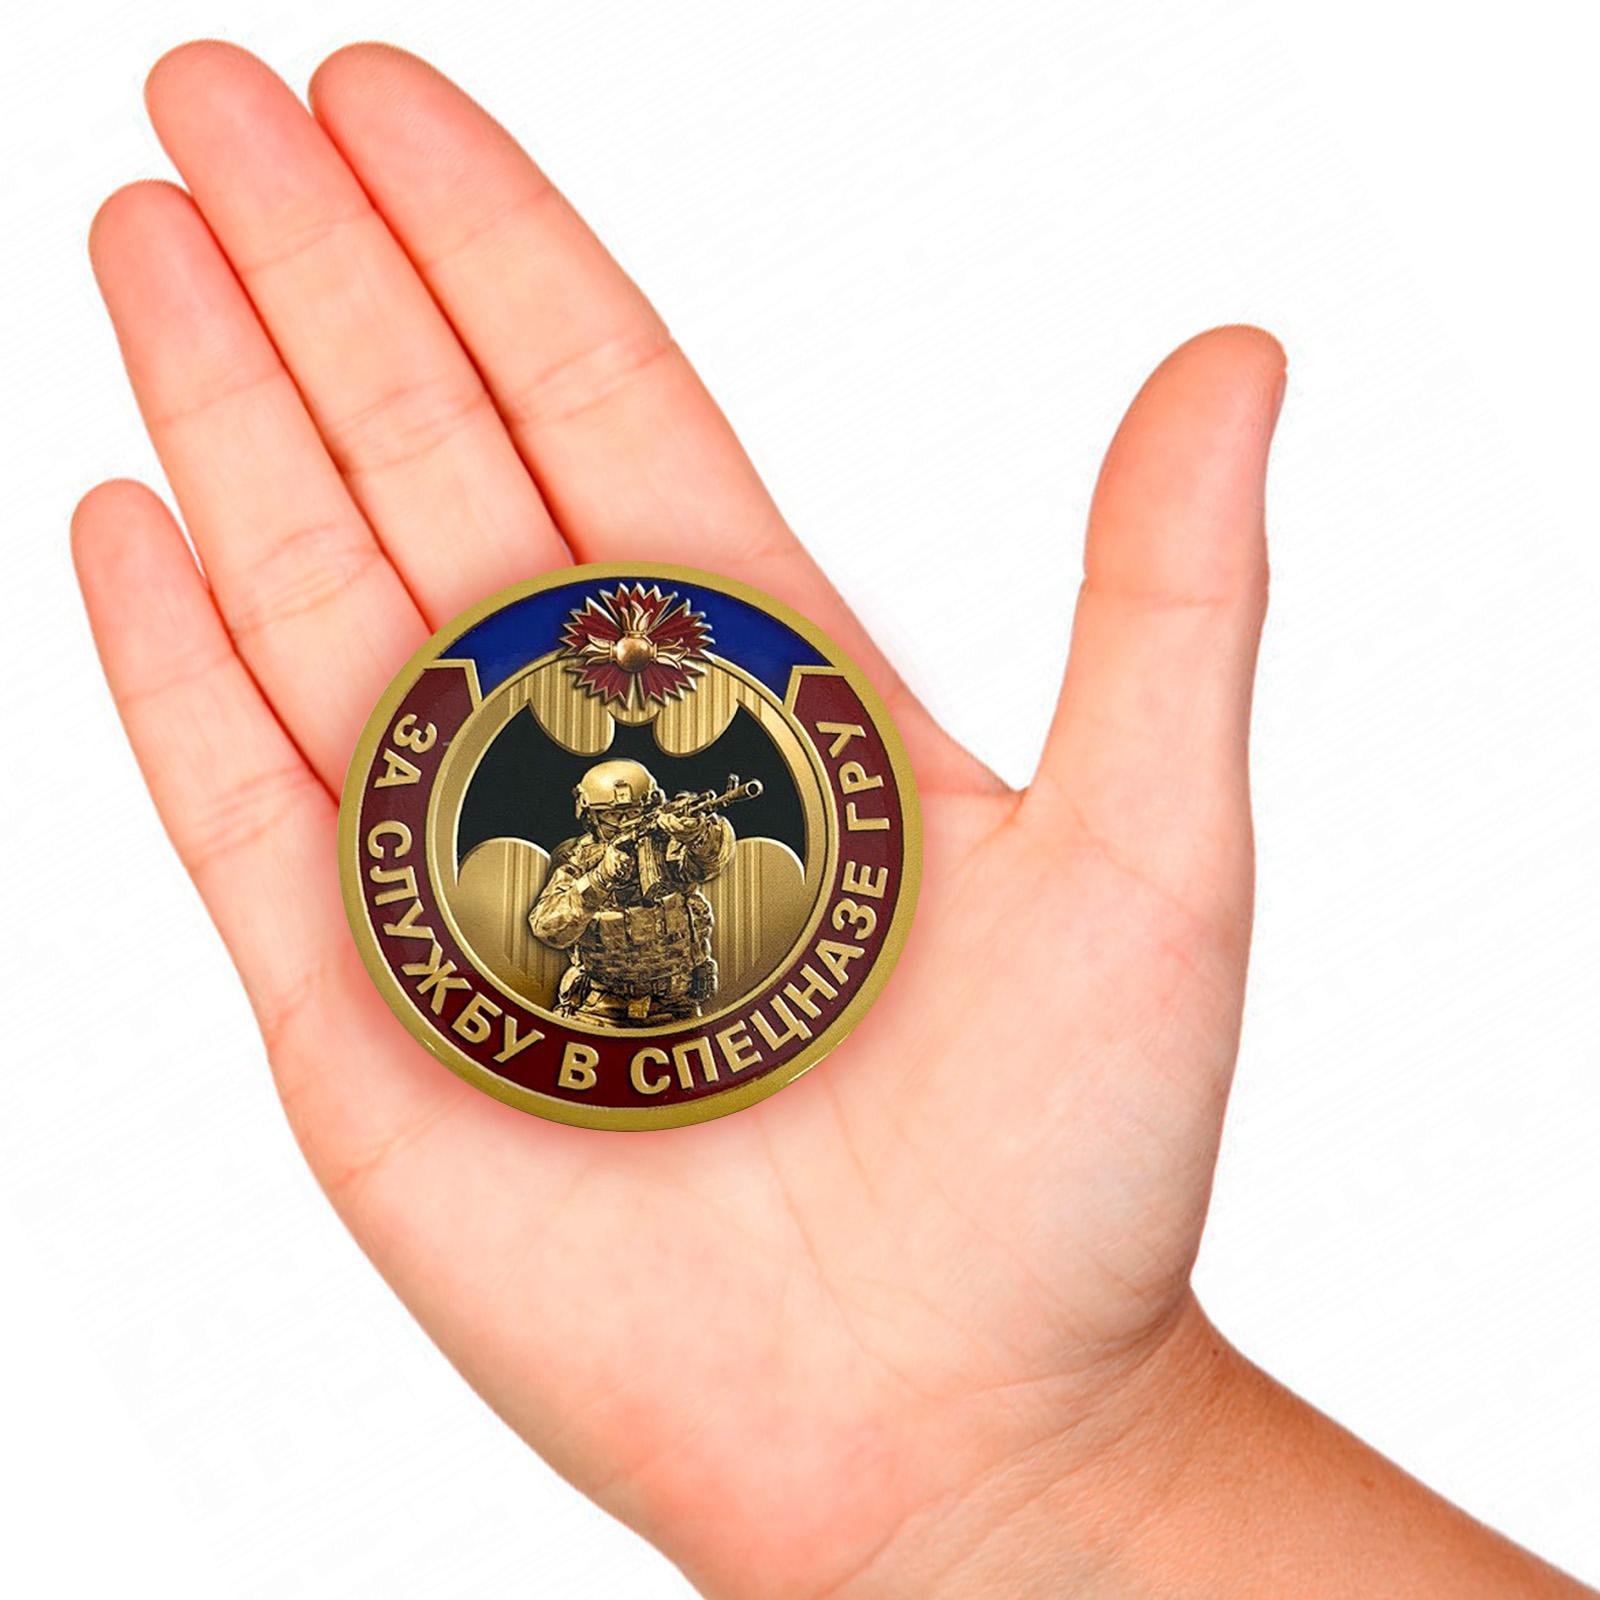 Закатный значок За службу в спецназе ГРУ - вид на руке